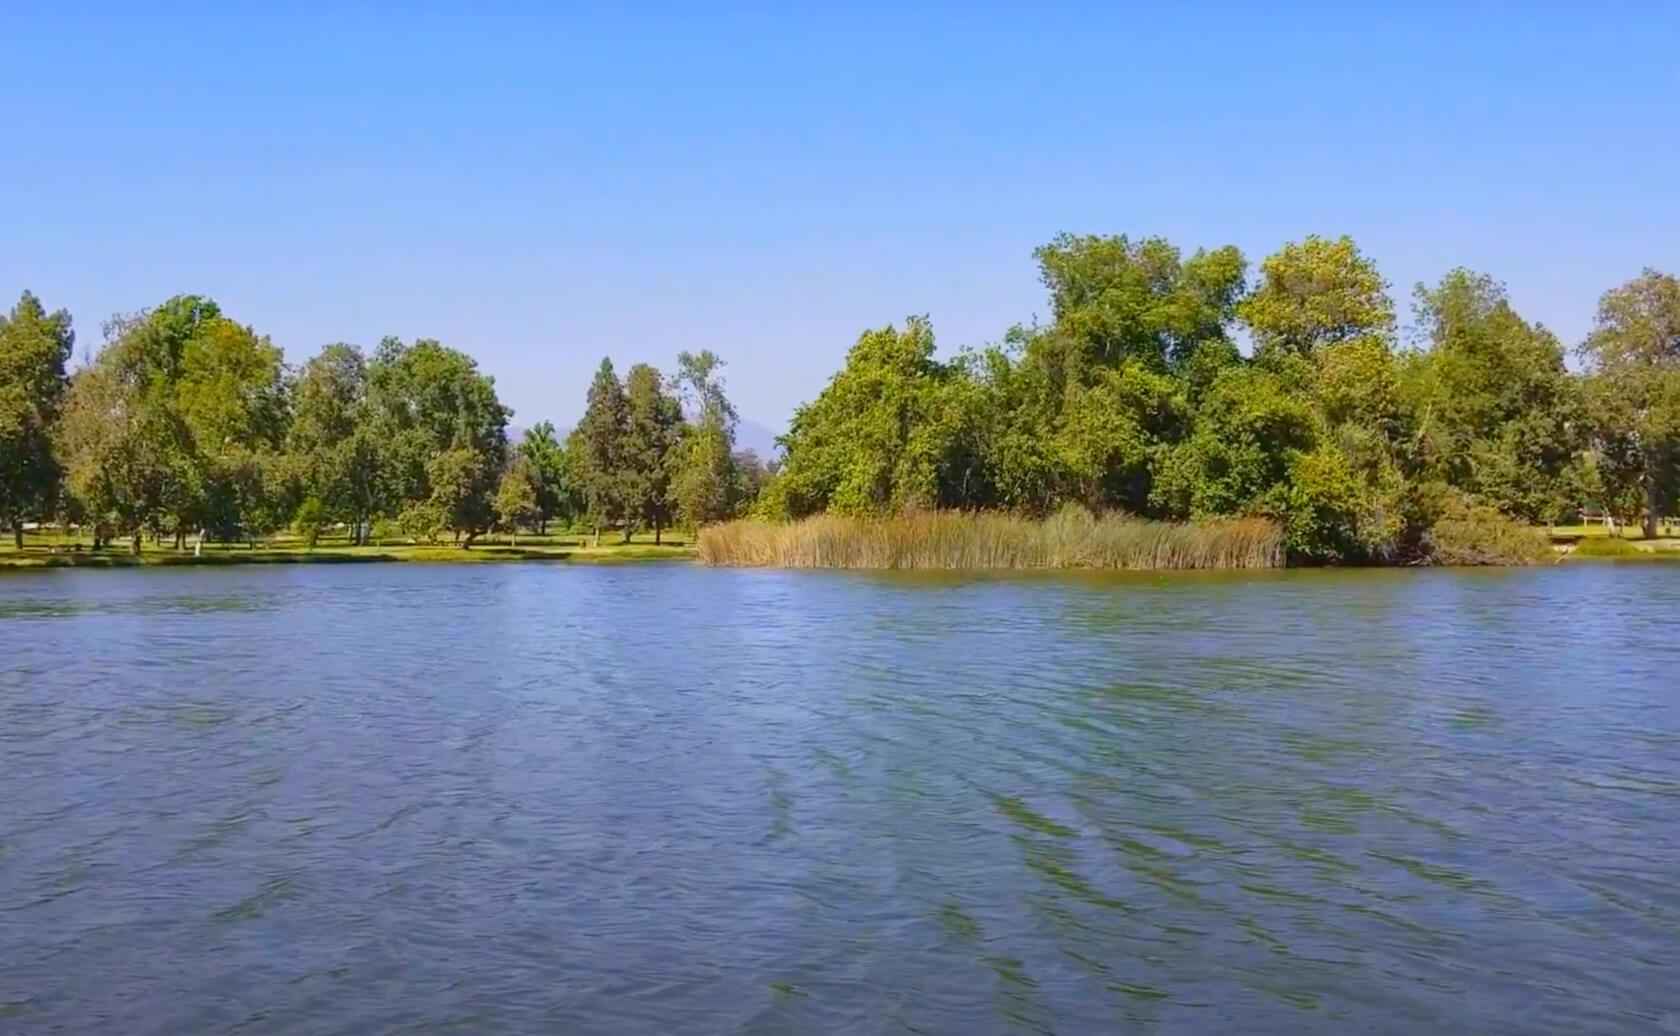 Legg-Lake-Fishing-Guide-Report-South-El-Monte-CA-91733-01